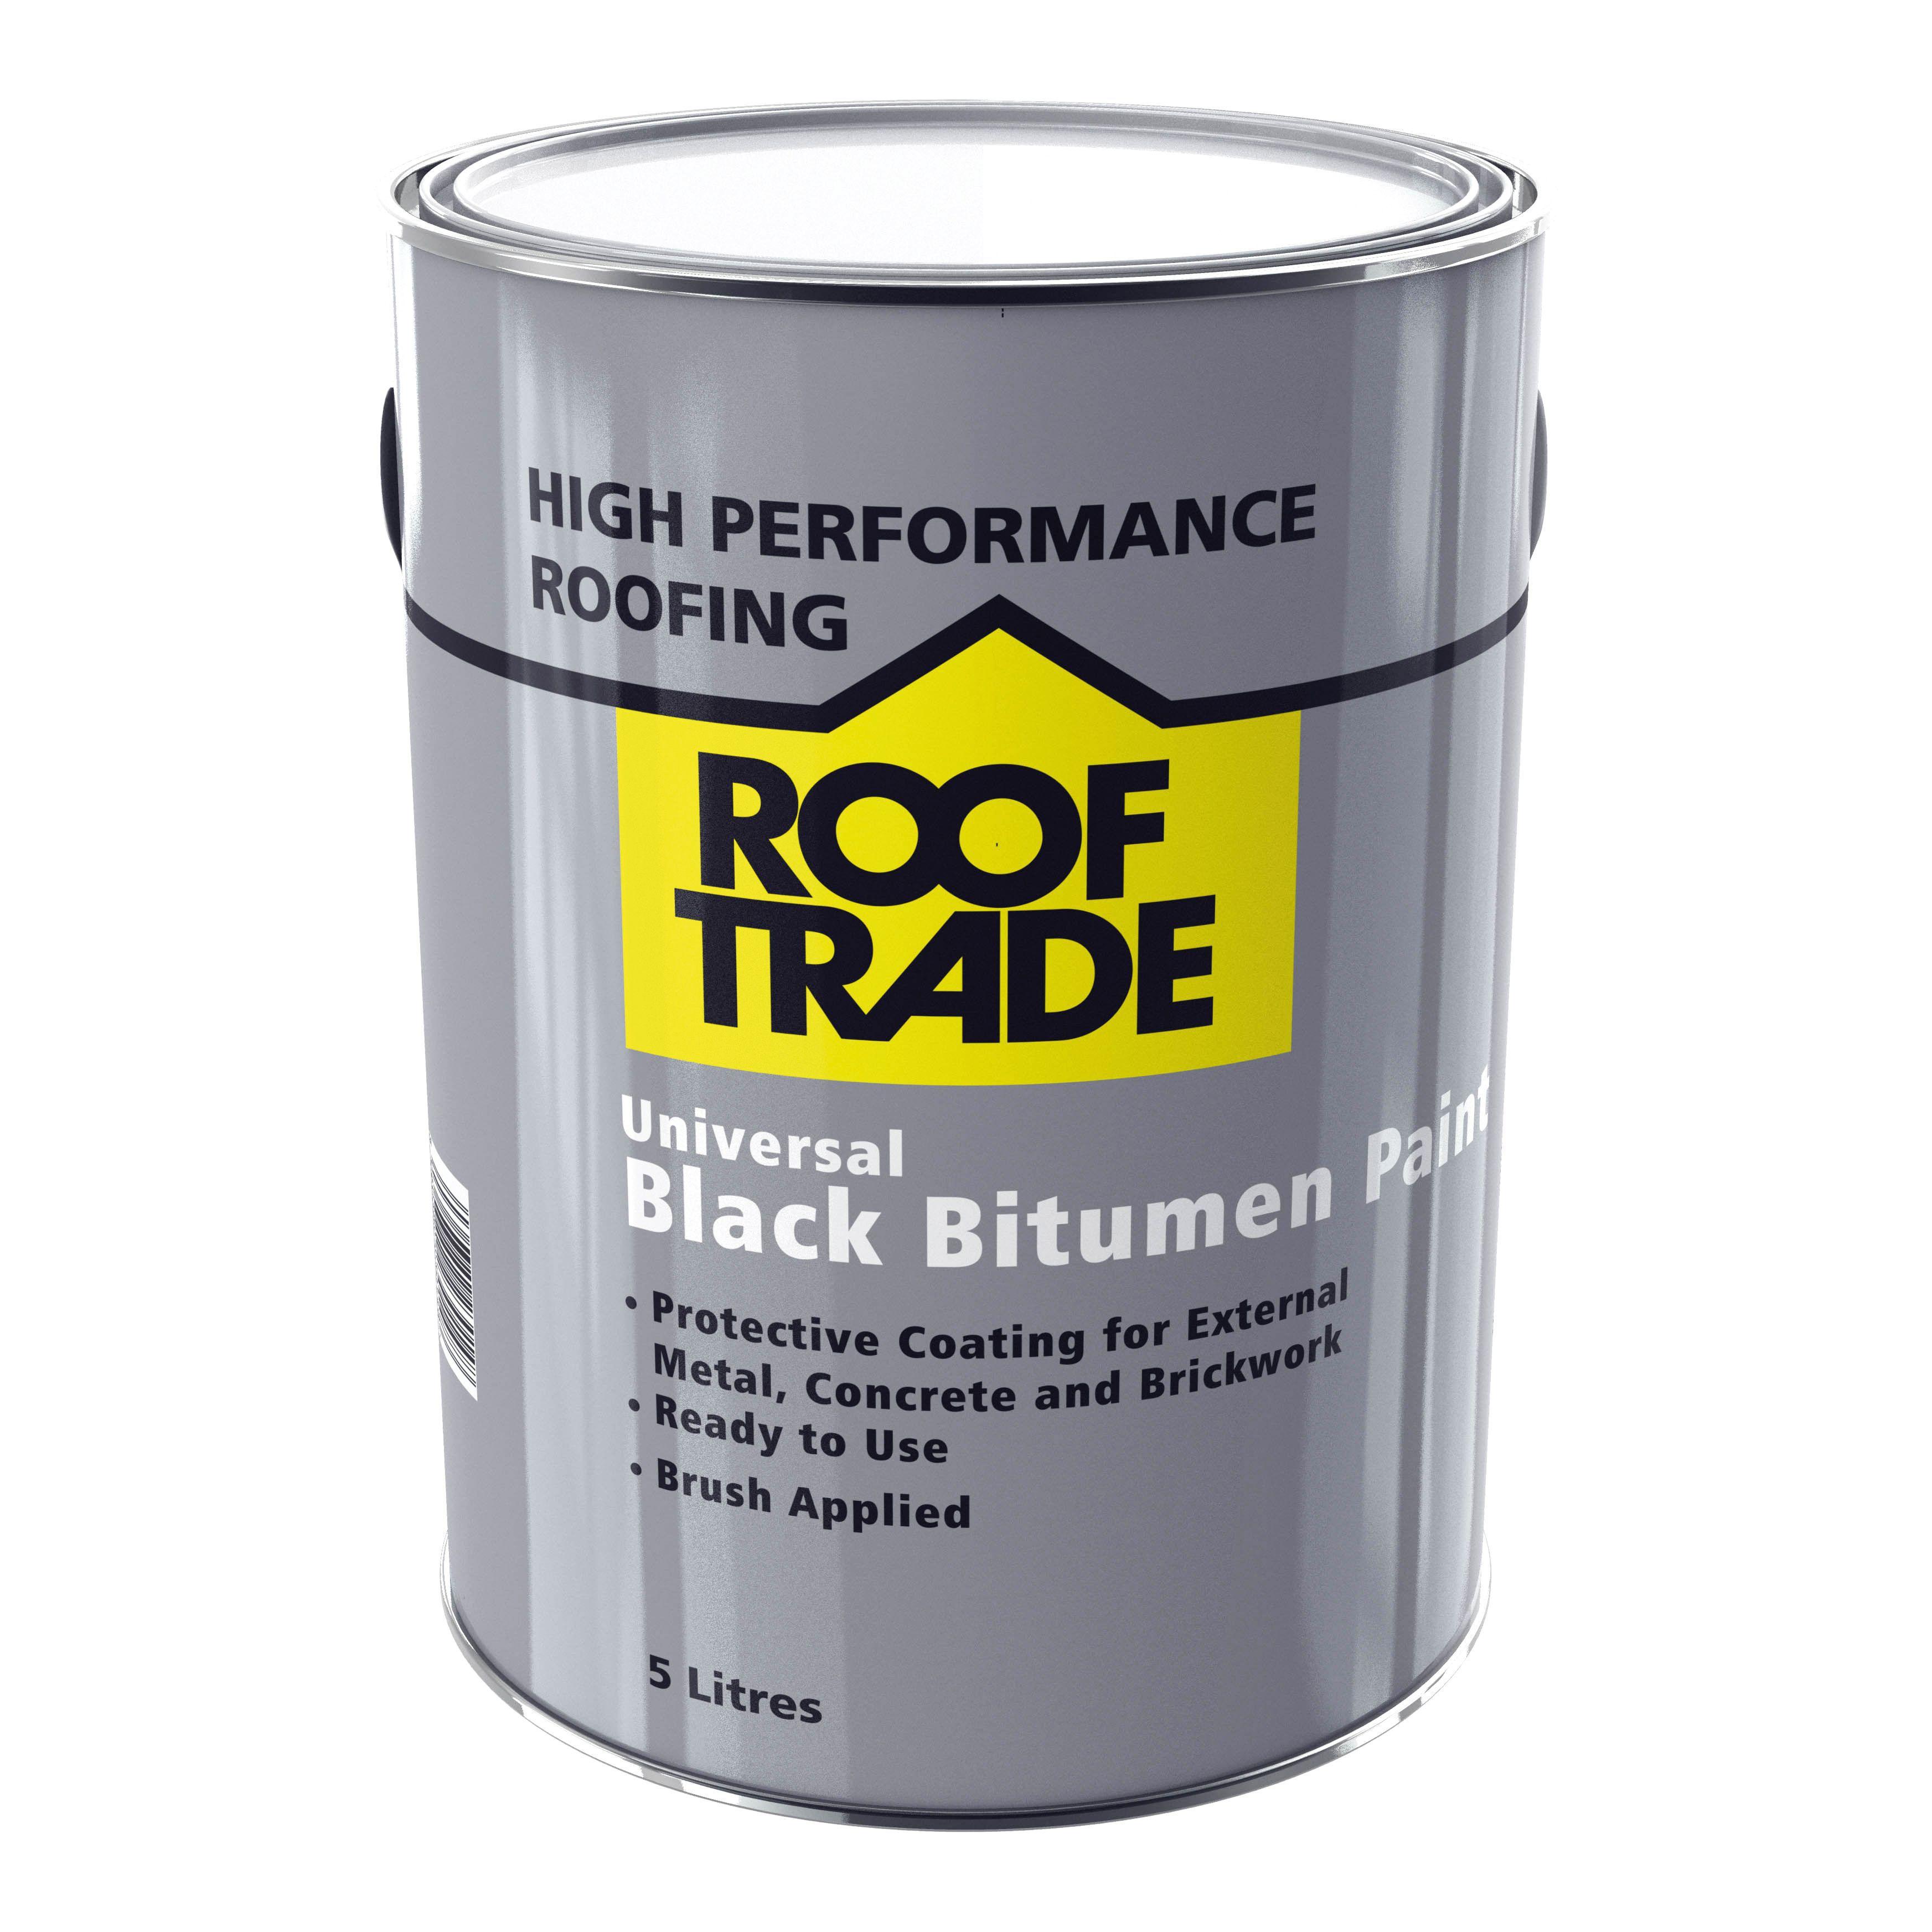 Universal Black Bitumen Paint